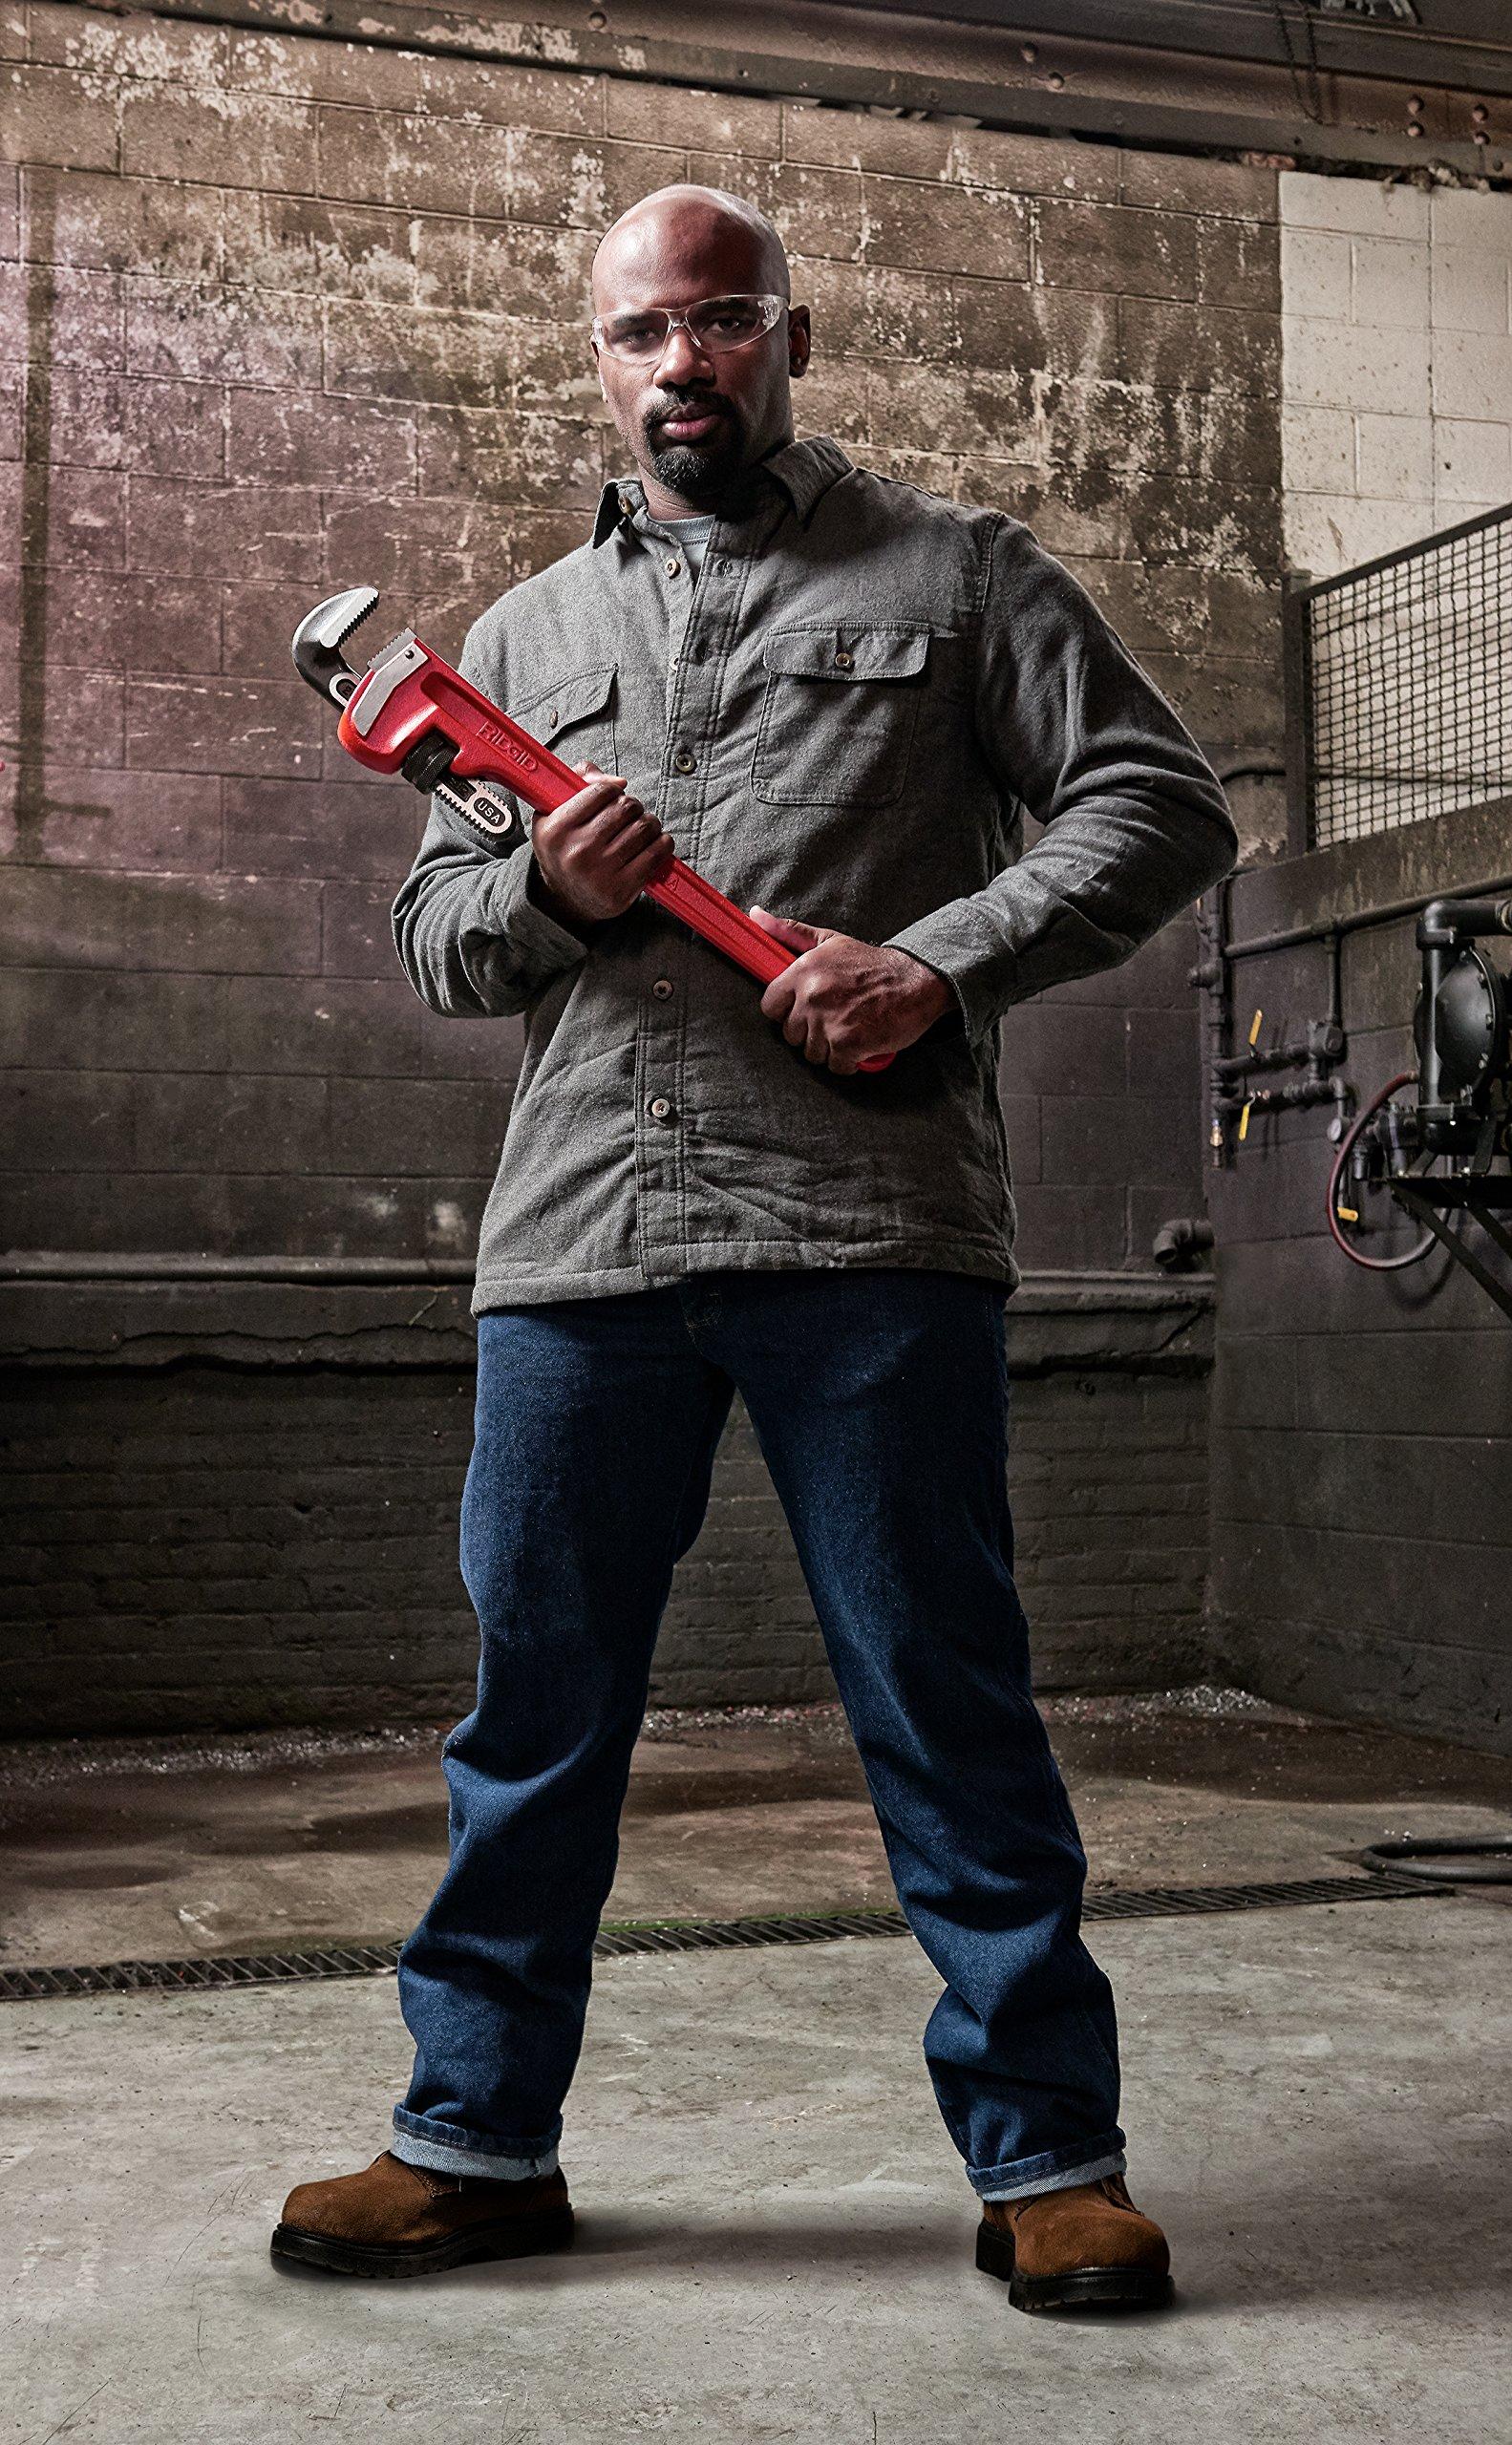 RIDGID 31030 Model 24 Heavy-Duty Straight Pipe Wrench, 24-inch Plumbing Wrench by Ridgid (Image #6)